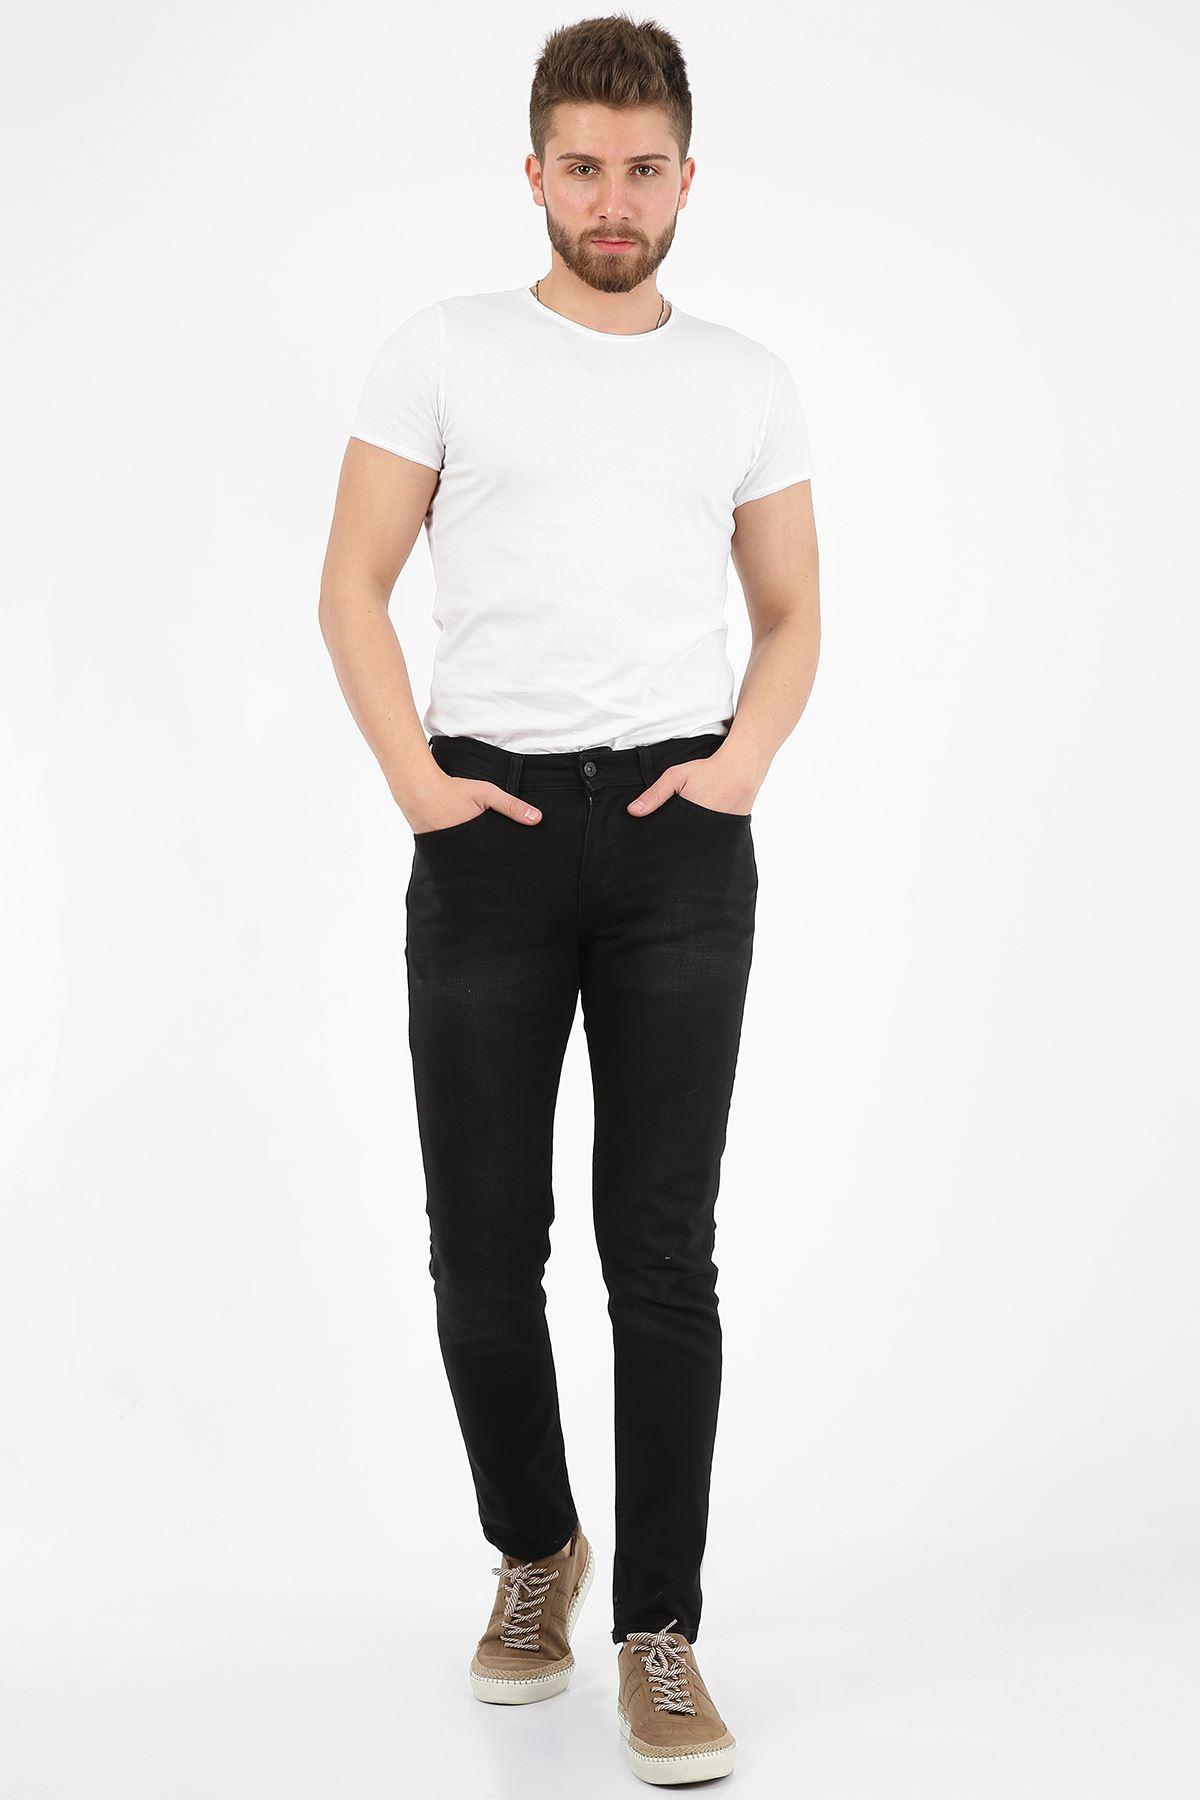 Siyah Yumuşak Doku Slim Fit Fermuarlı Erkek Jeans Pantolon-JONAS